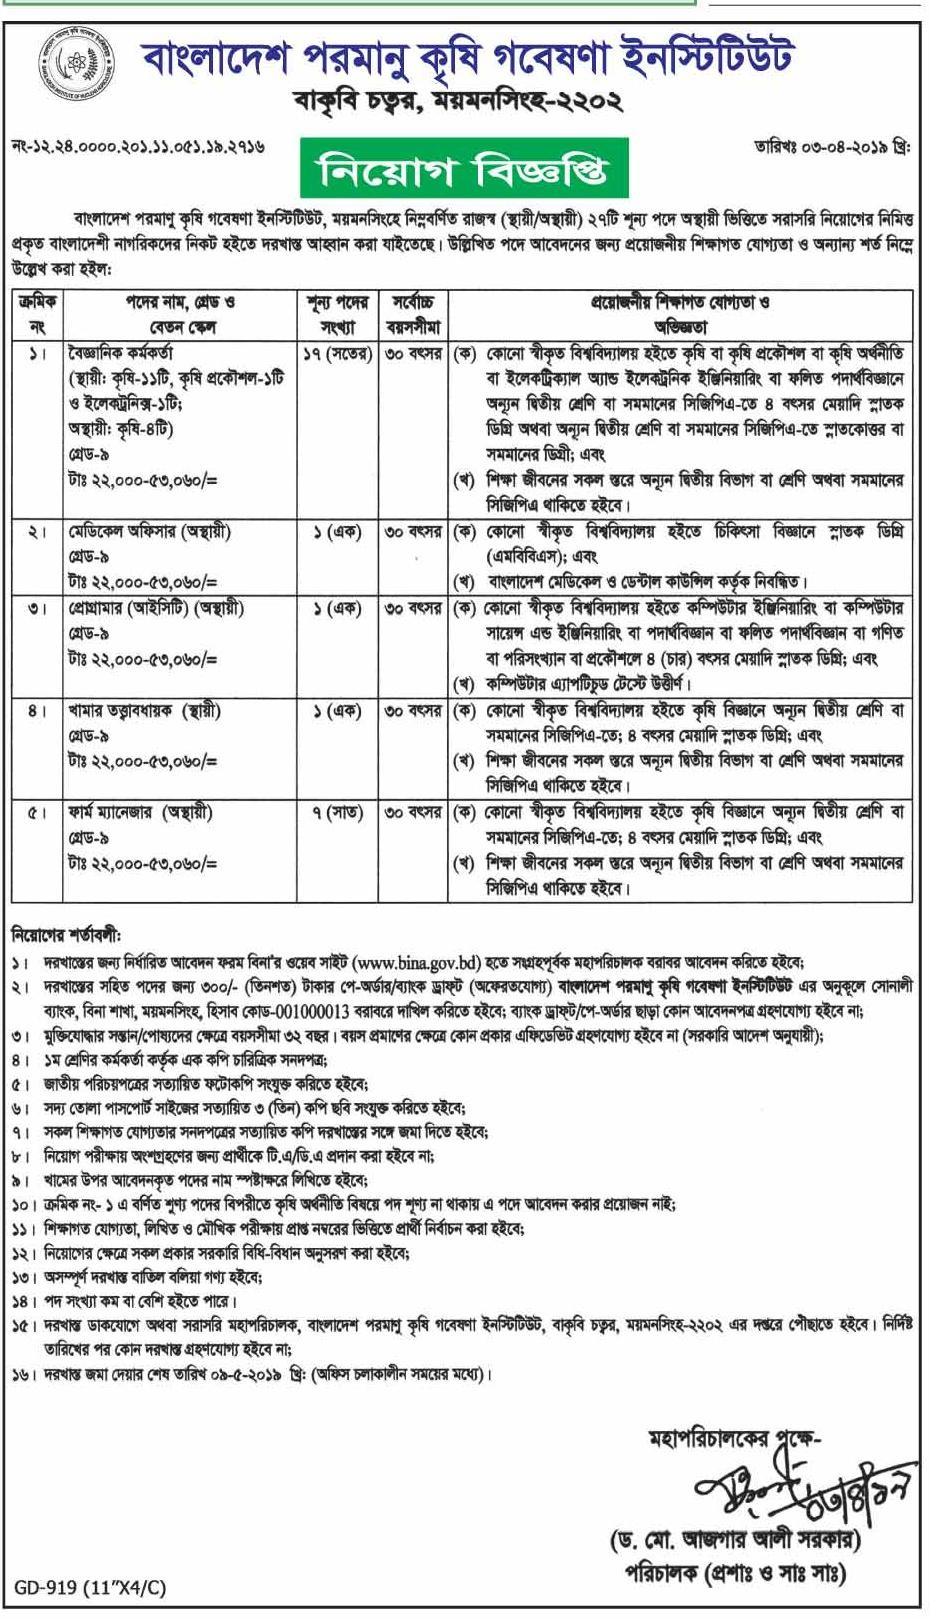 Bangladesh Institute of Nuclear Agriculture Job Circular 2018